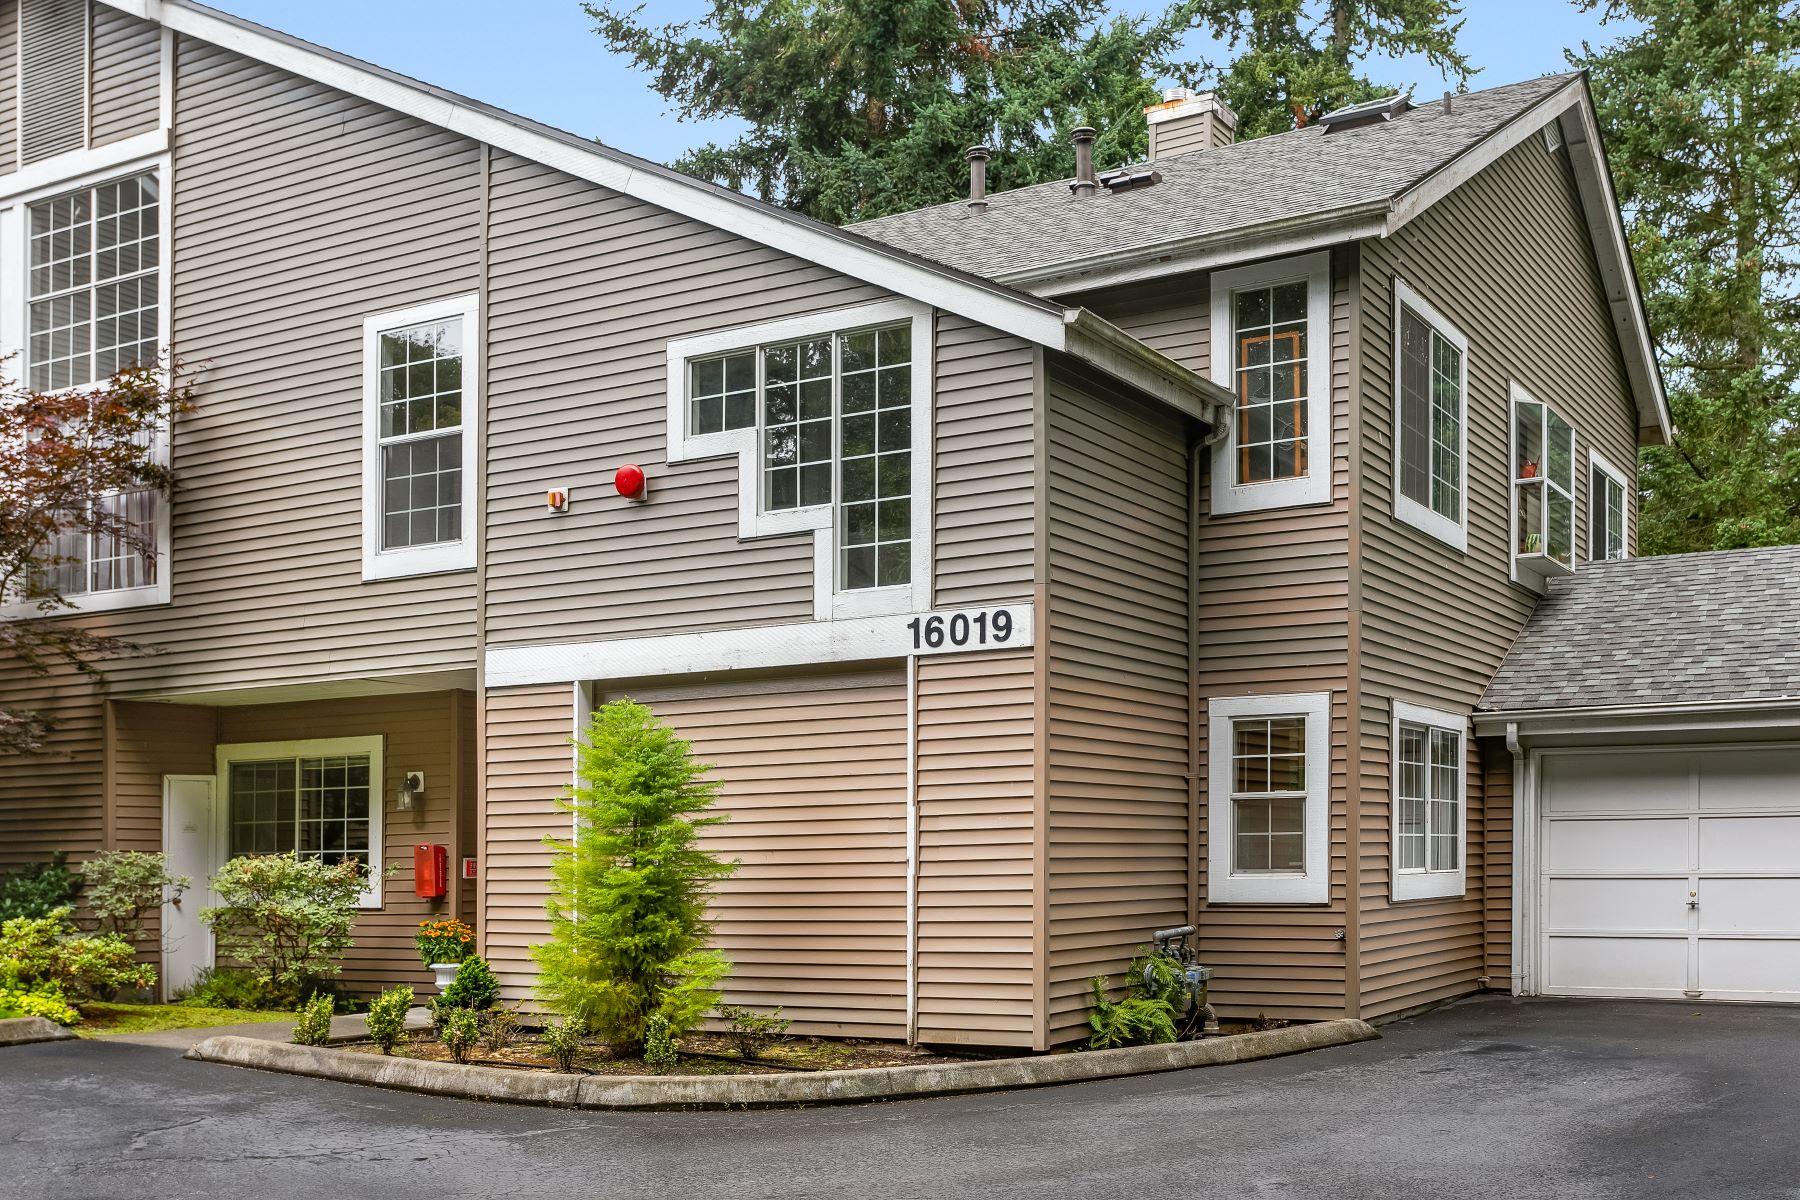 Condominiums for Sale at 16019 67th Lane NE Unit #1-1, Kenmore, WA 98028 16019 67th Lane NE Unit #1-1 Kenmore, Washington 98028 United States